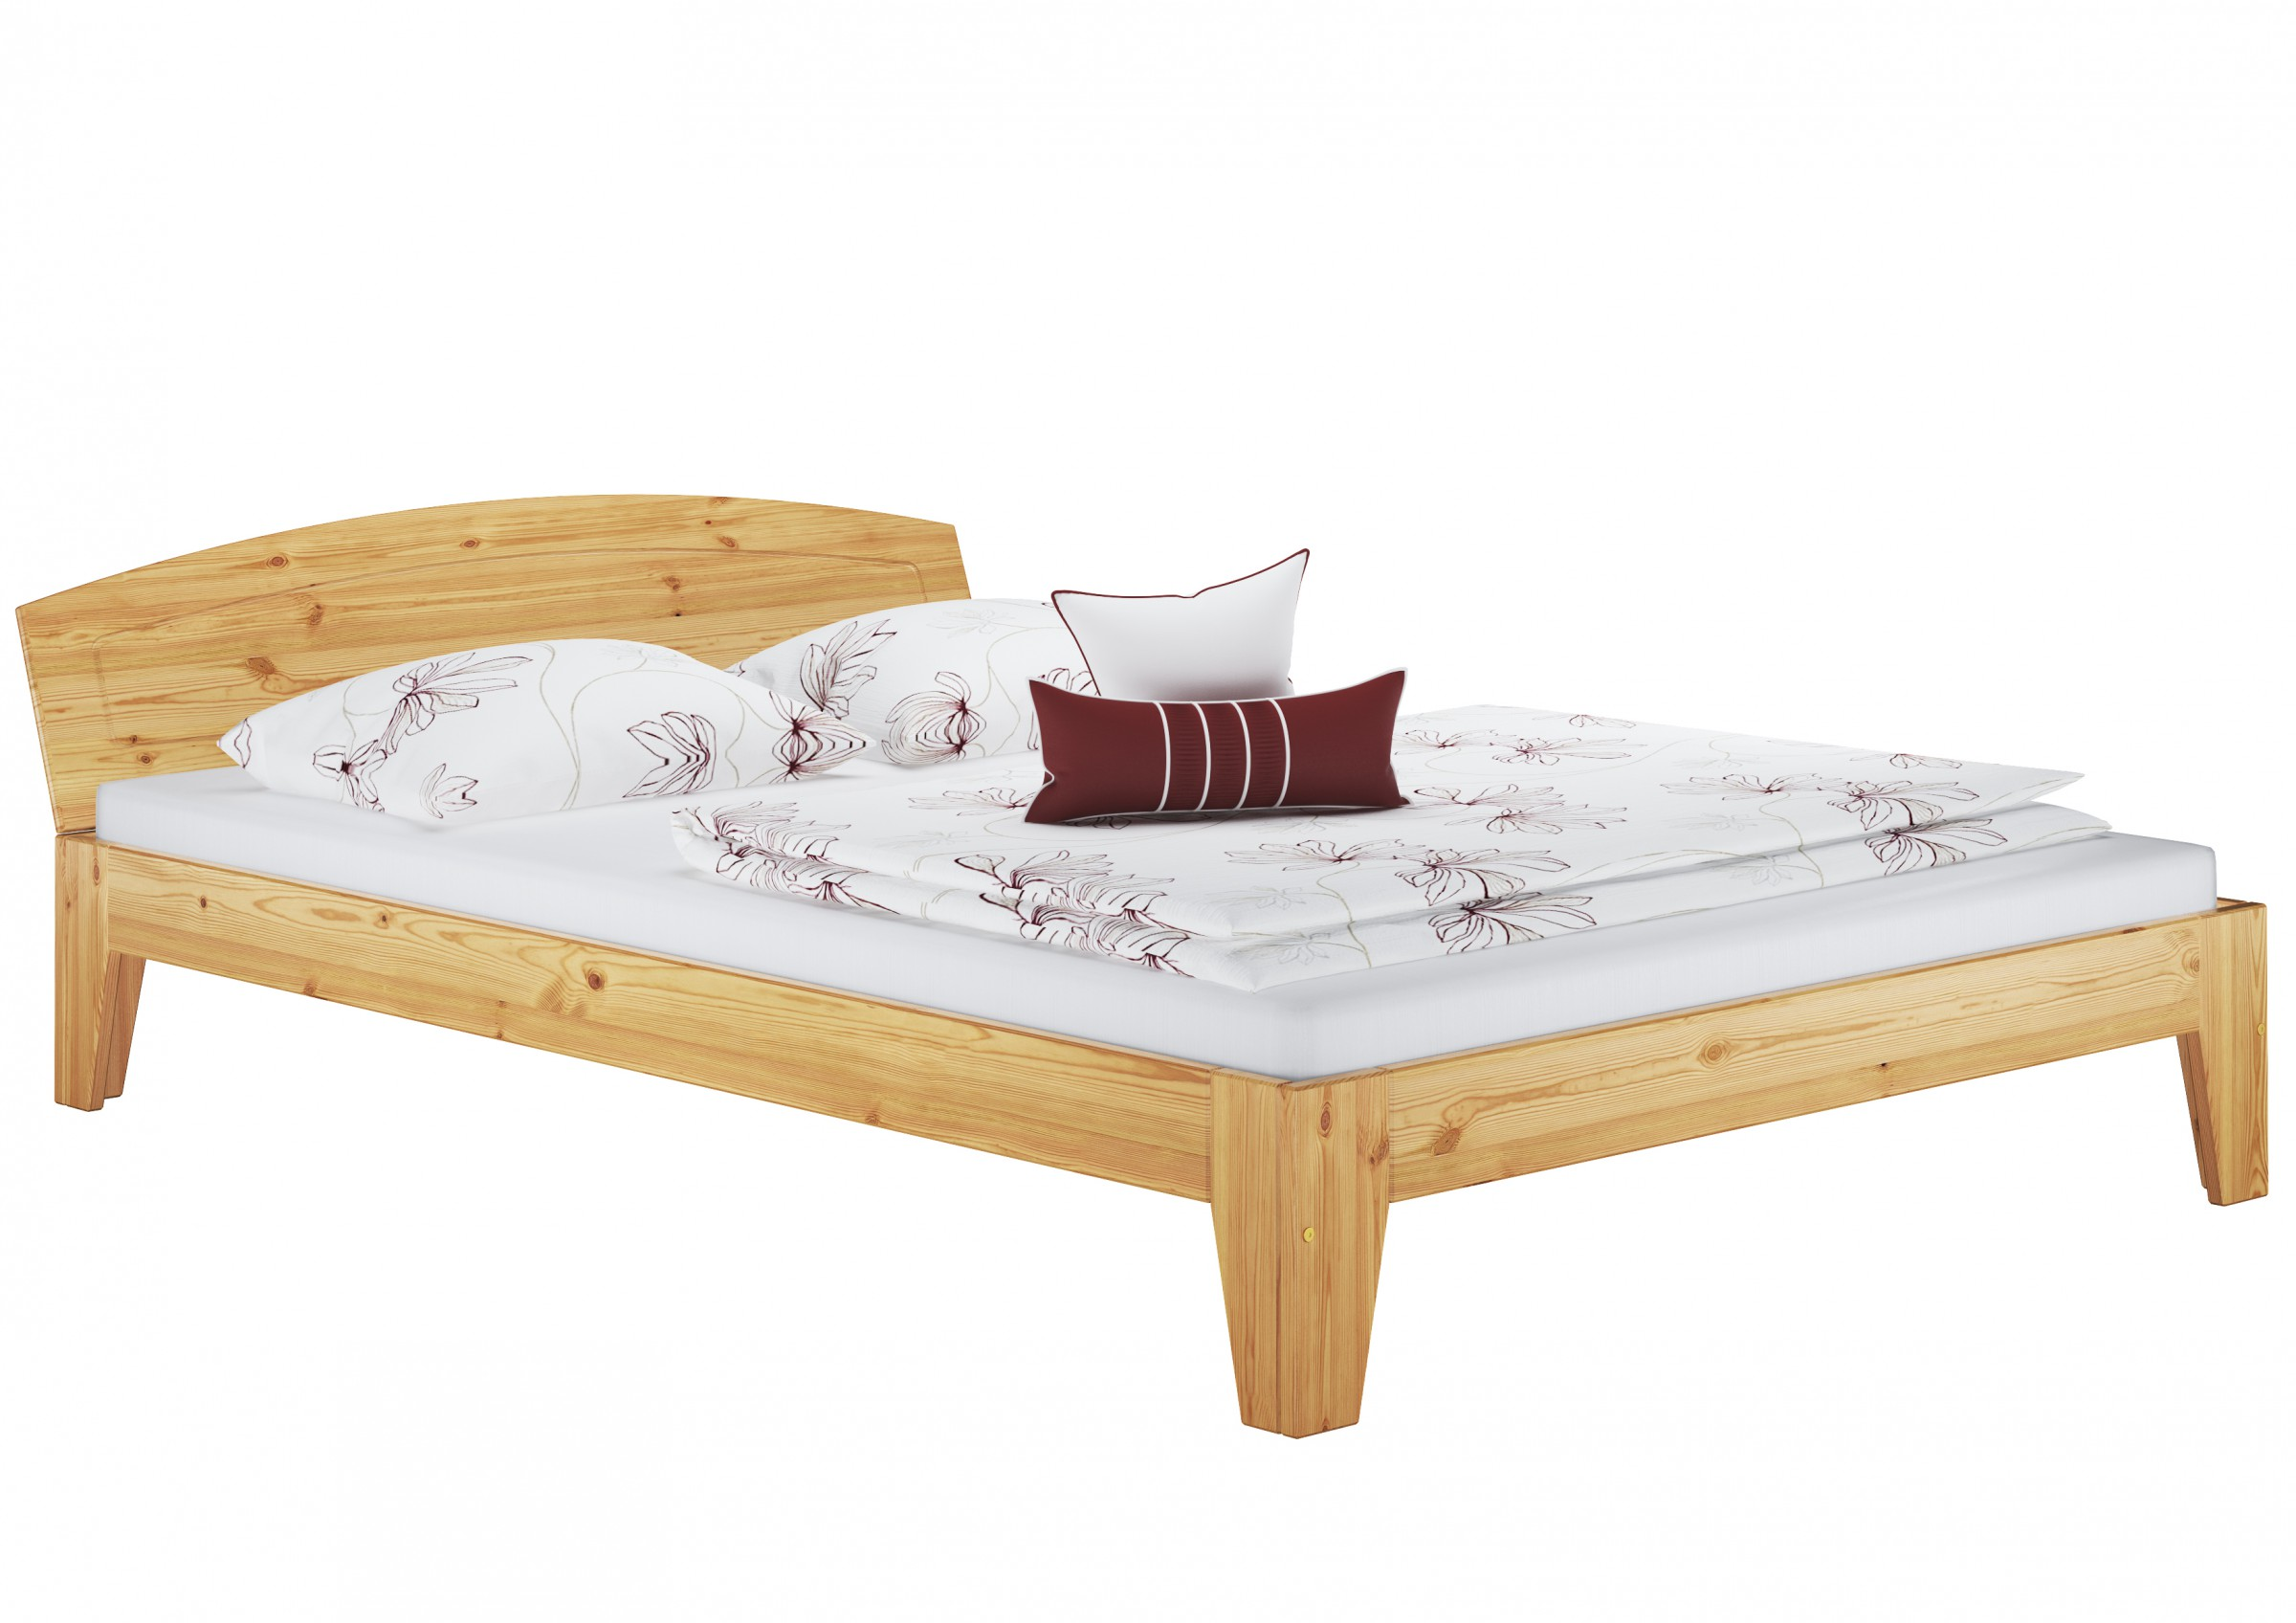 Doppelbett holzbett franz sisches bett kiefer massiv for Bett kiefer massiv